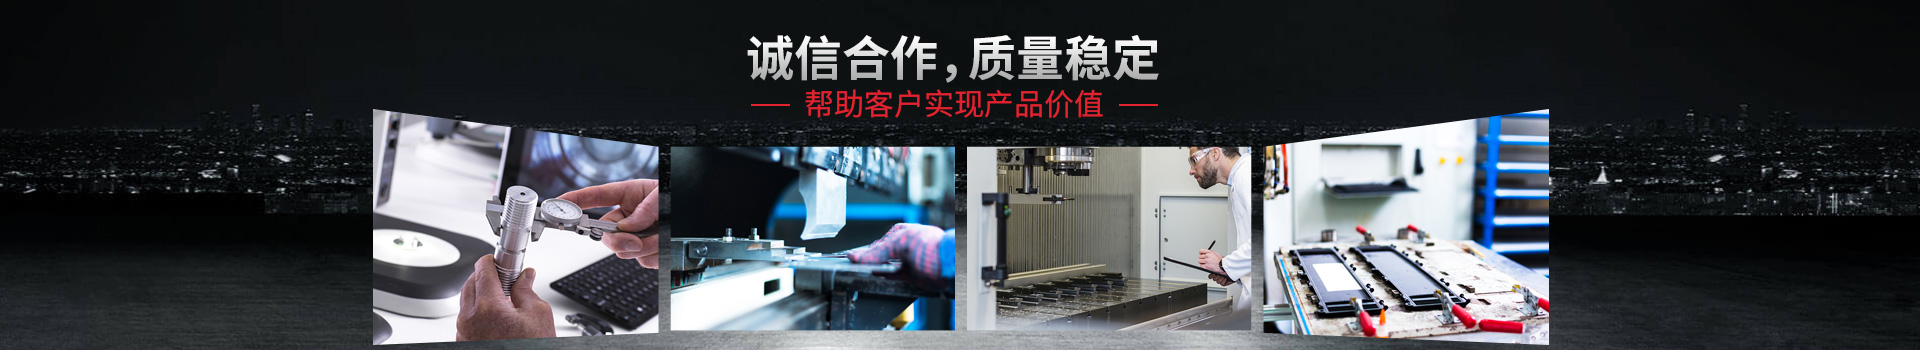 CNC精密機械加工,CNC加工定制,深圳CNC加工廠家——誠信合作,質量穩定